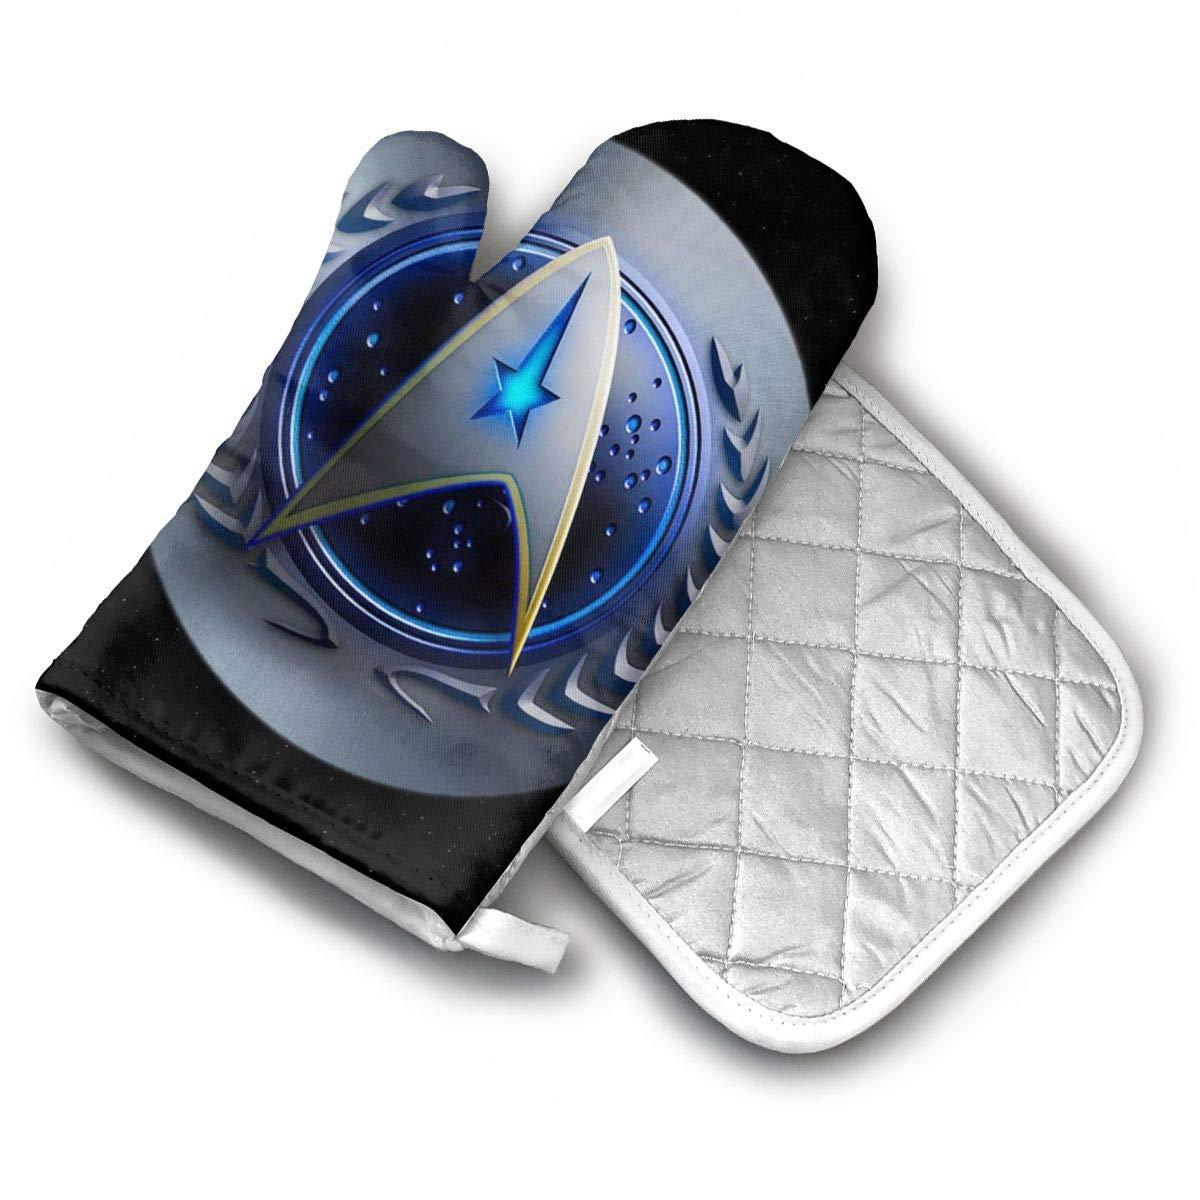 AISDHAJKSD Star Trek Federation Logo Premium Terylene/Nylon Oven Mitts and Pot Mat,Pot Mat/Hot Pads, Heat Resistant Gloves BBQ Kitchen